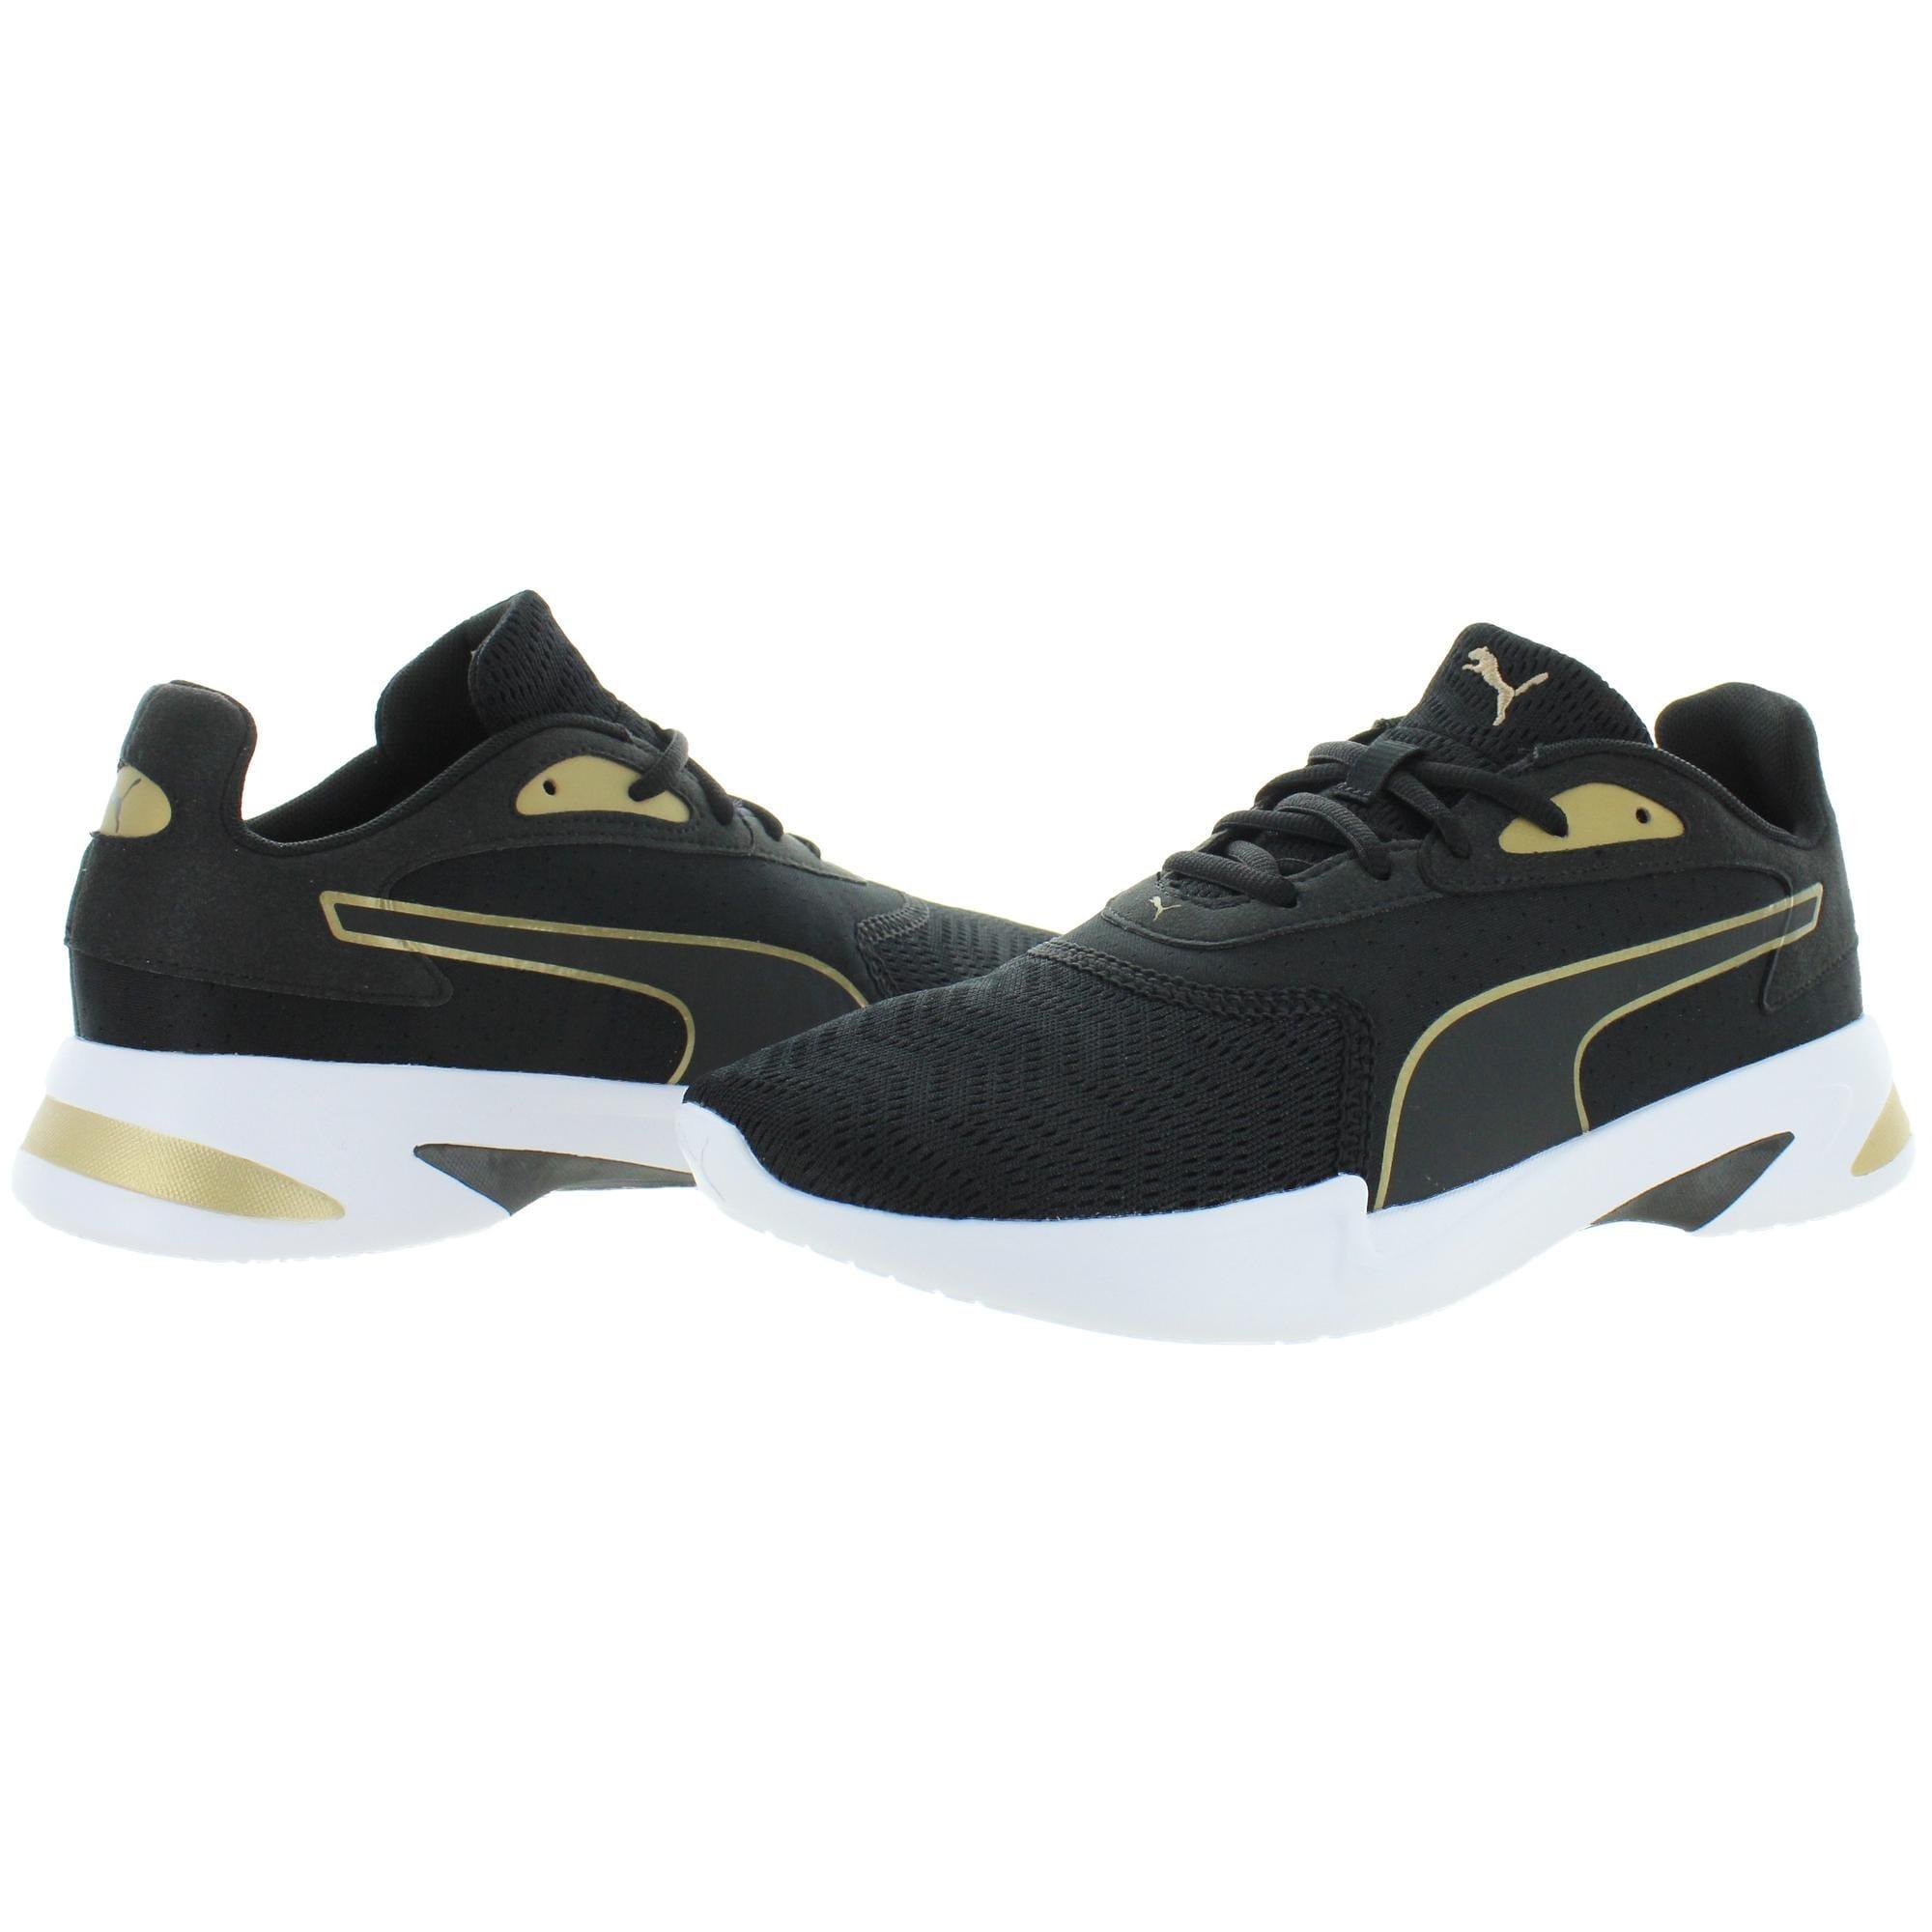 memory foam puma shoes, OFF 76%,Latest